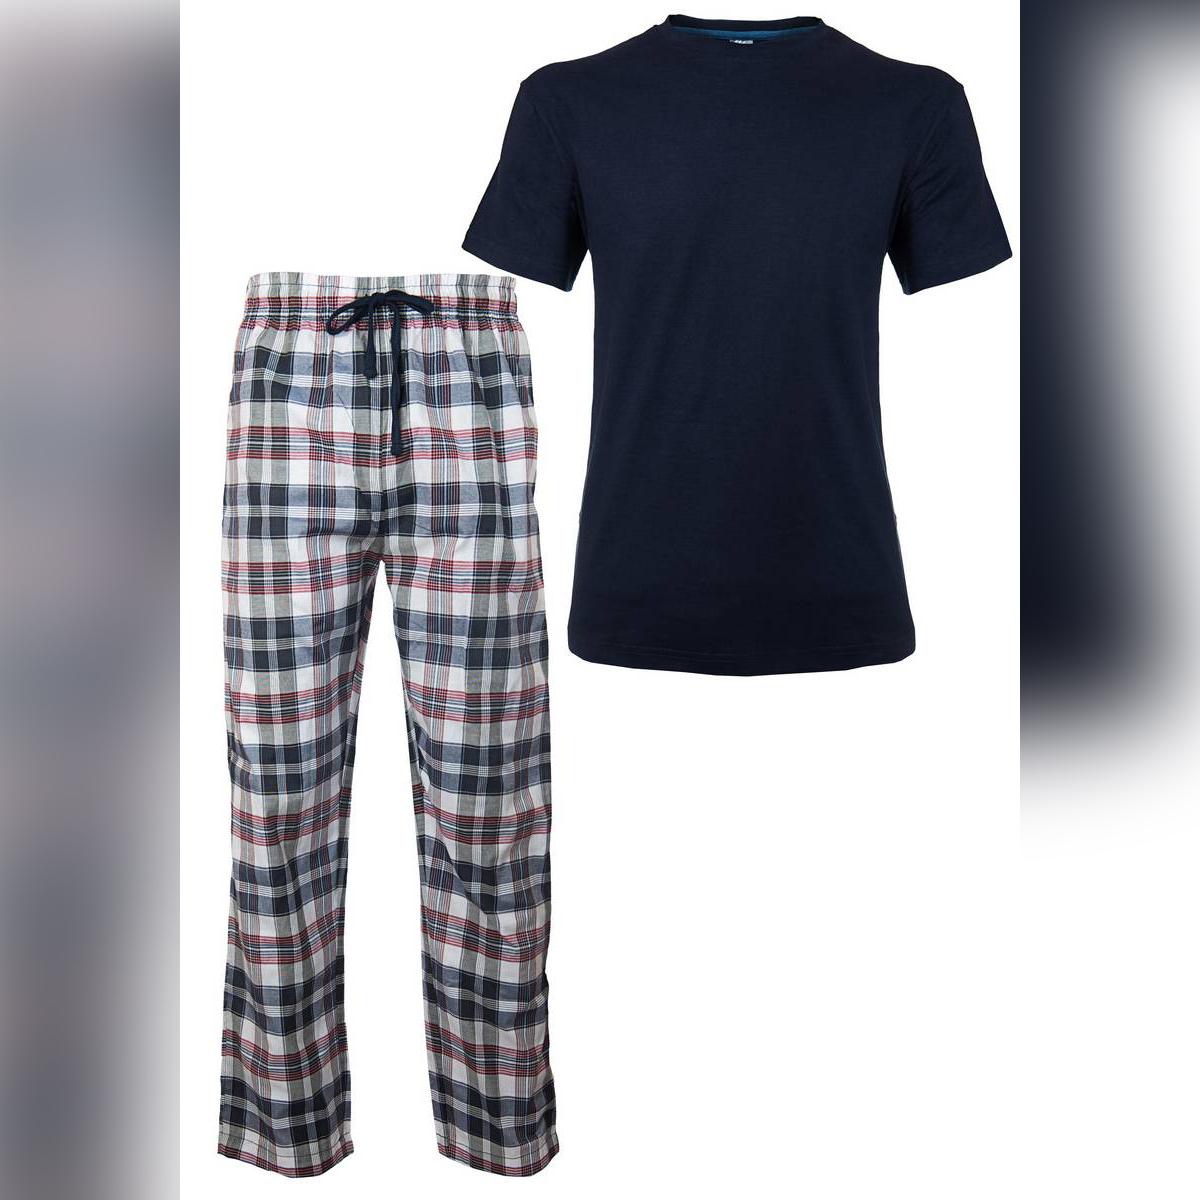 Men's New Pyjamas Set, Checked Pyjamas for Men, Men's Pj's Cotton Short Sleeves Round Neck T-Shirts, Woven Men's Pyjamas. NEW Men's CHECK Print Pyjama Set, Lounge Wear, Short Sleeve T Shirt Top, Night Wear. ~ Navy 2